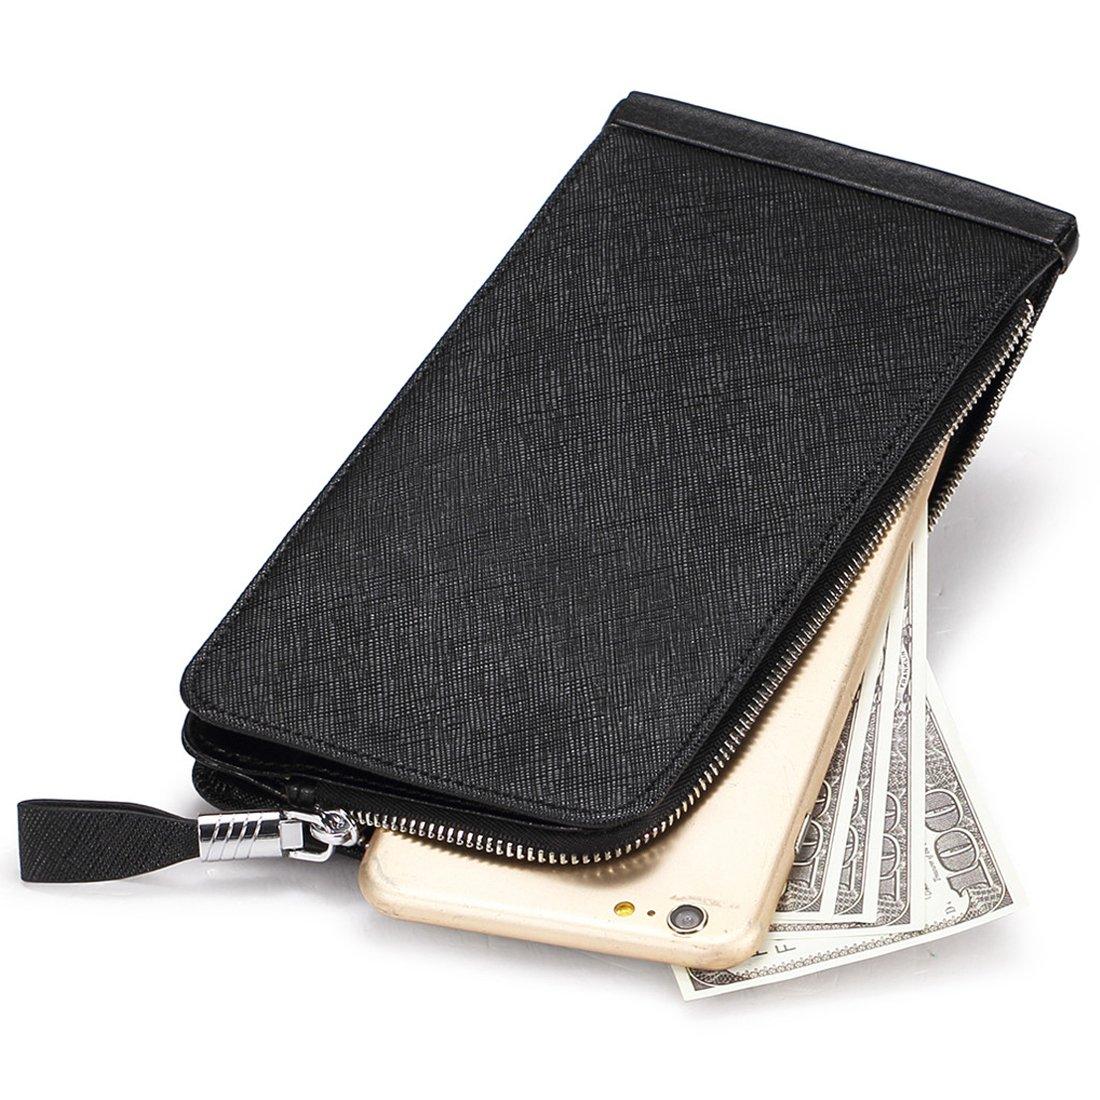 Huztencor Women's Credit Card Holder RFID Blocking Leather Multi Card Organizer Wallet Slim Long Zipper Bi-fold Business Card Case Clutch Wallet with ID Window Black (FBA) by Huztencor (Image #5)